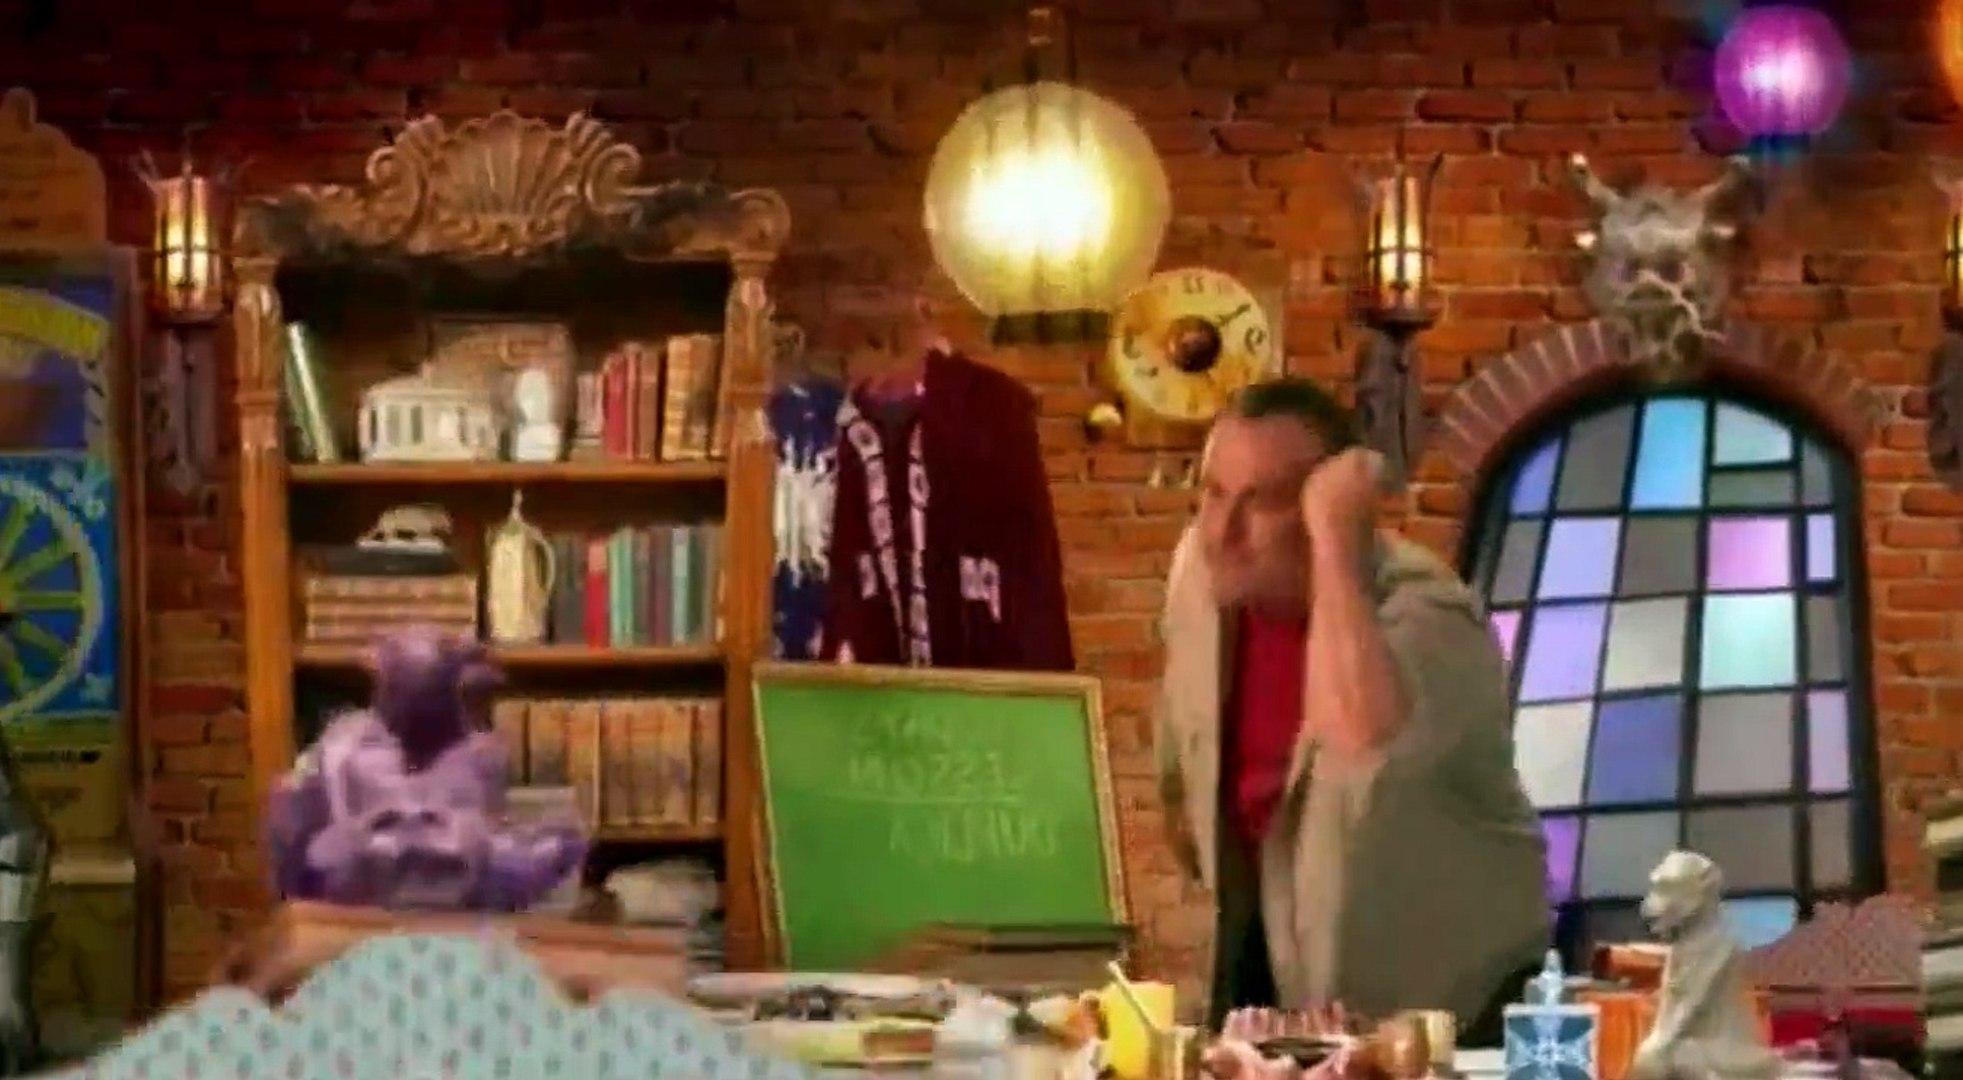 Wizards of Waverly Place - S 3 E 12 - Dude Looks Like Shakira